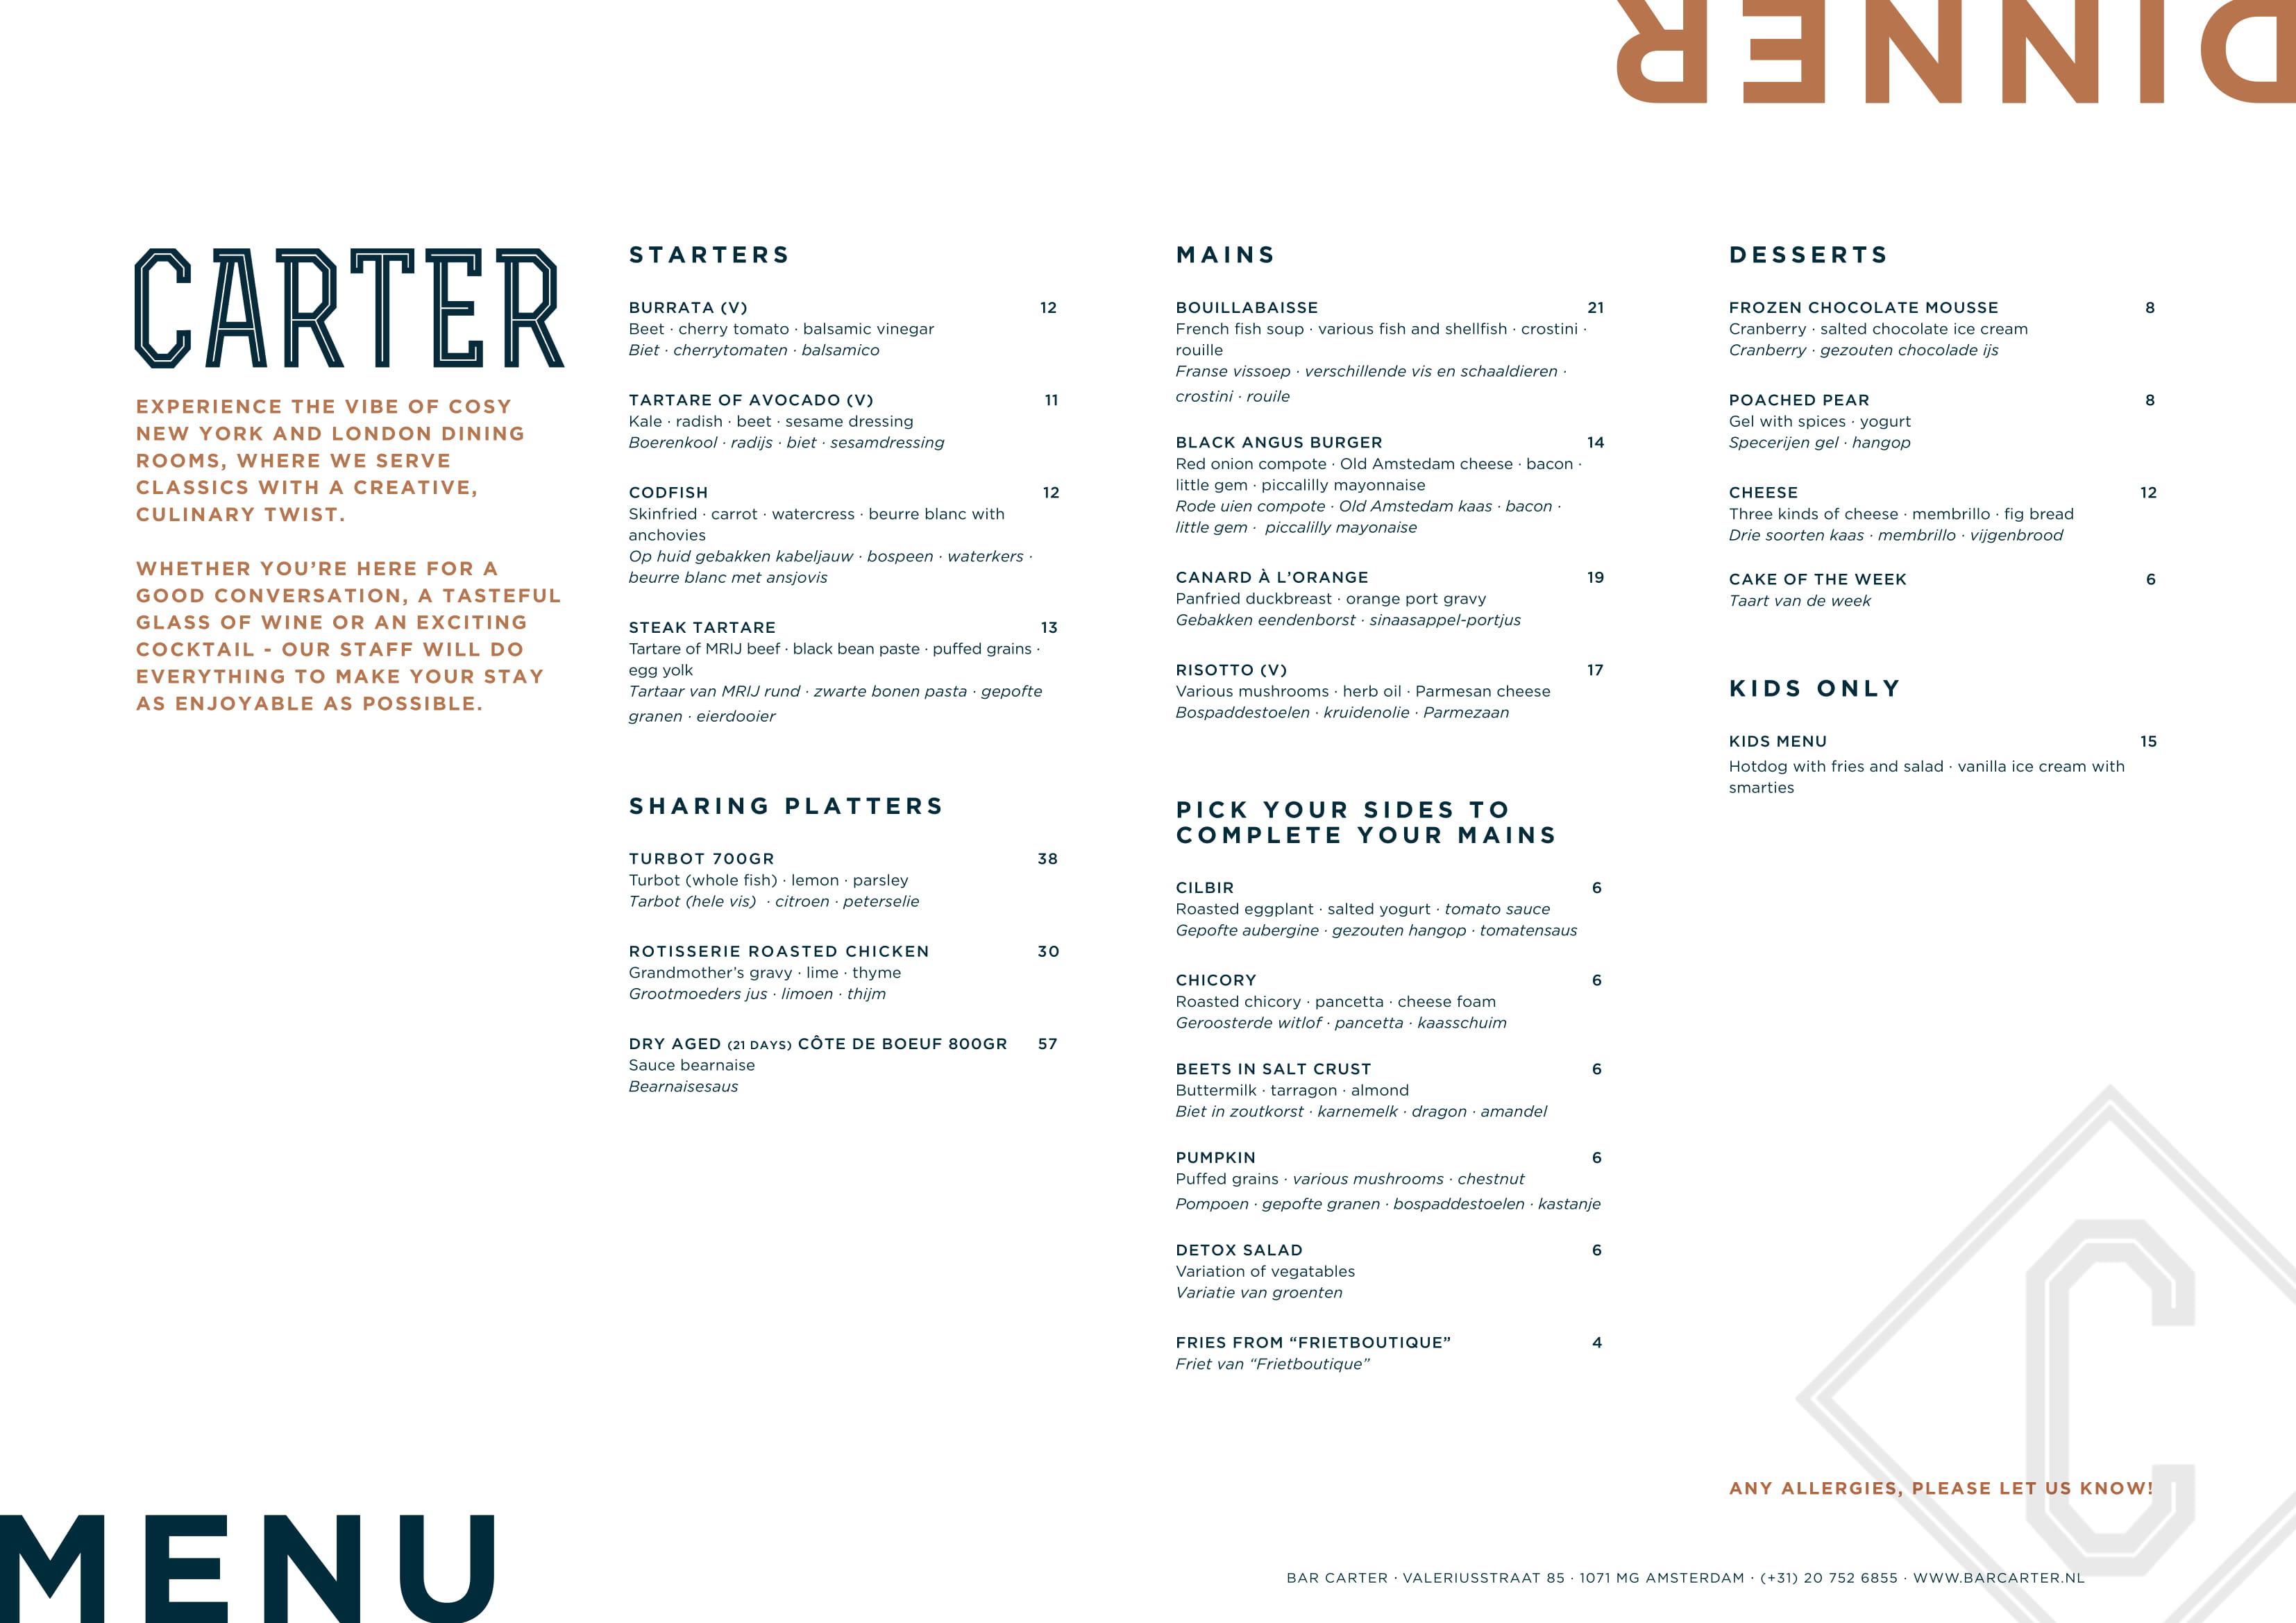 Carter fall menu 25-10-18 dinner-1